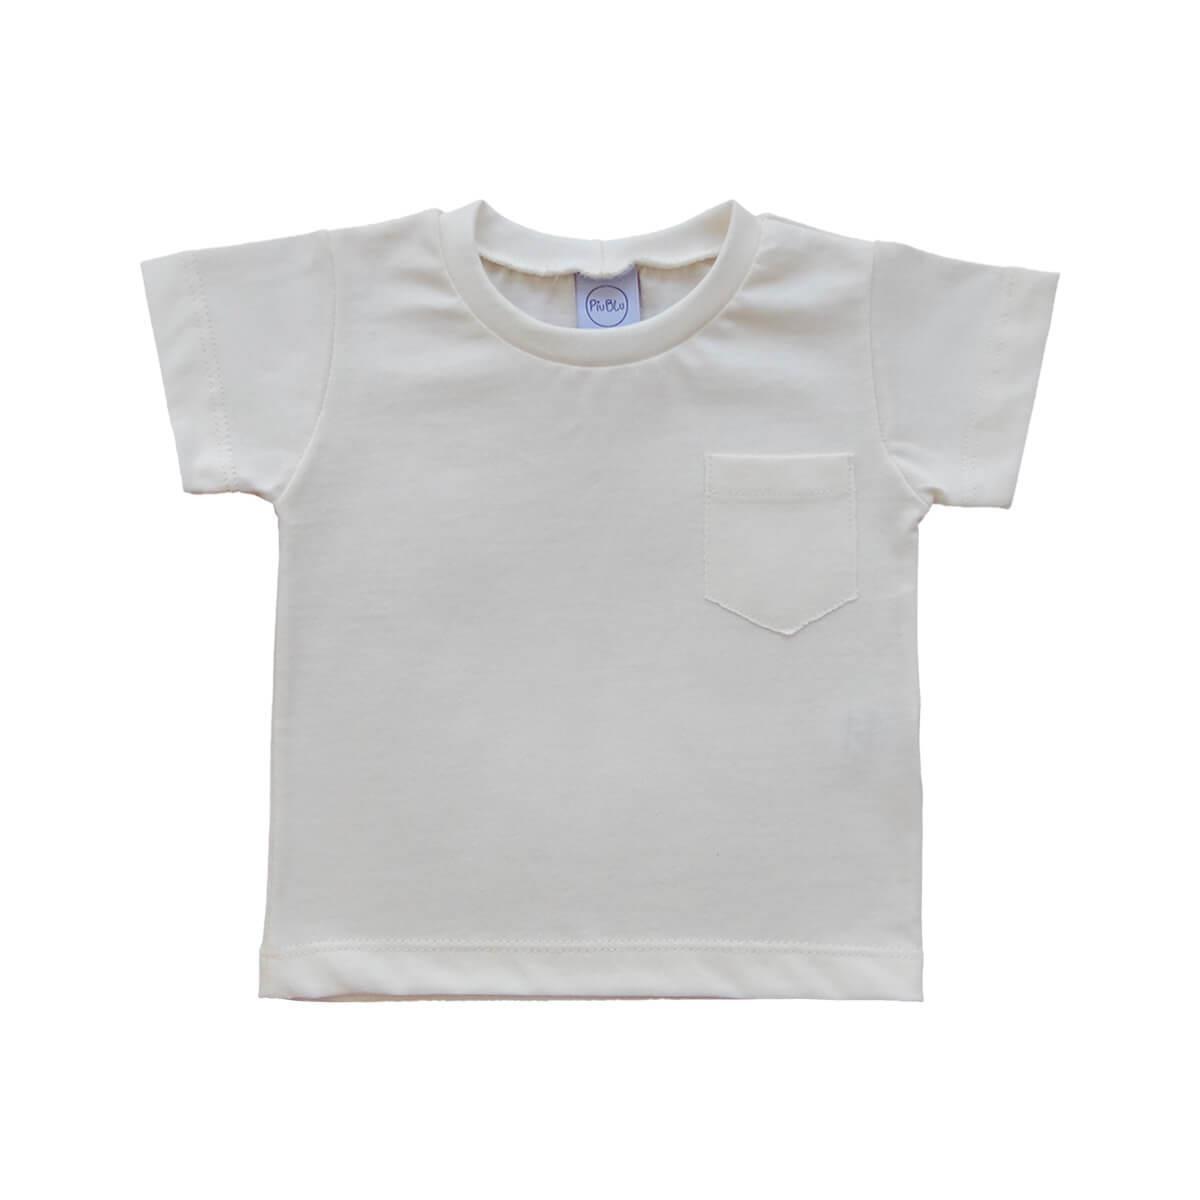 Camiseta Manga Curta Off White 1 ao 3